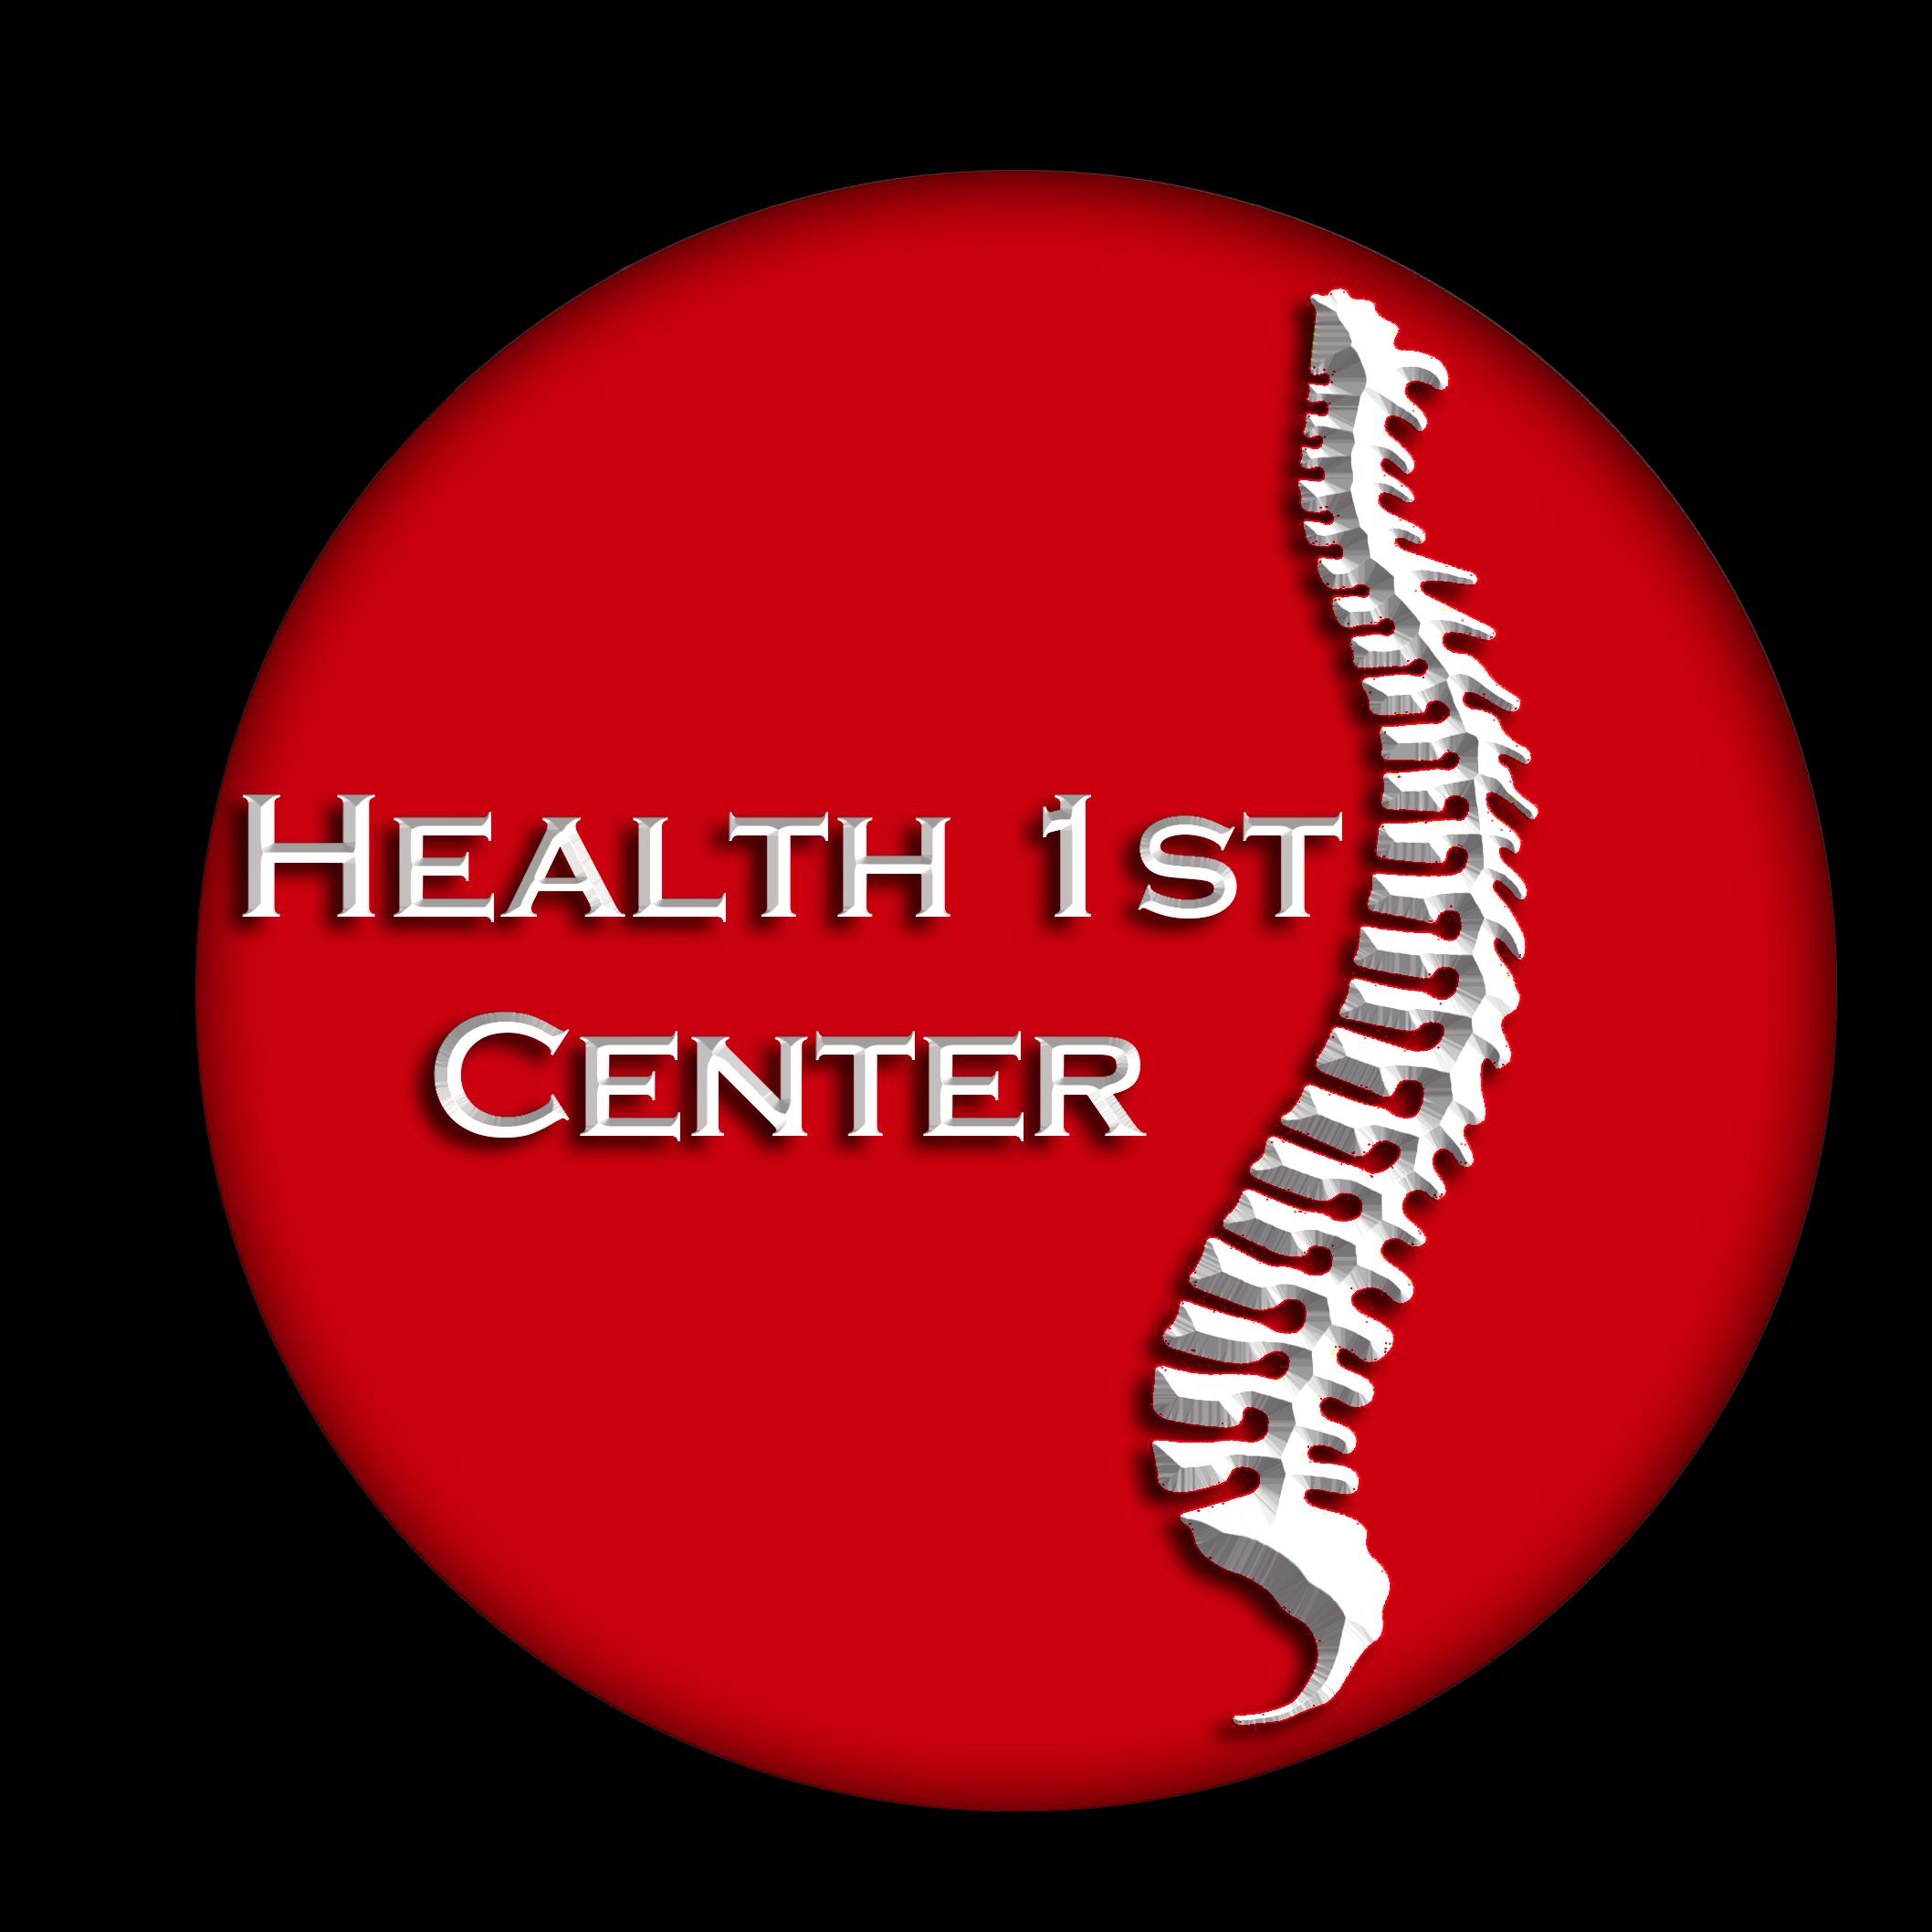 Health 1st Center